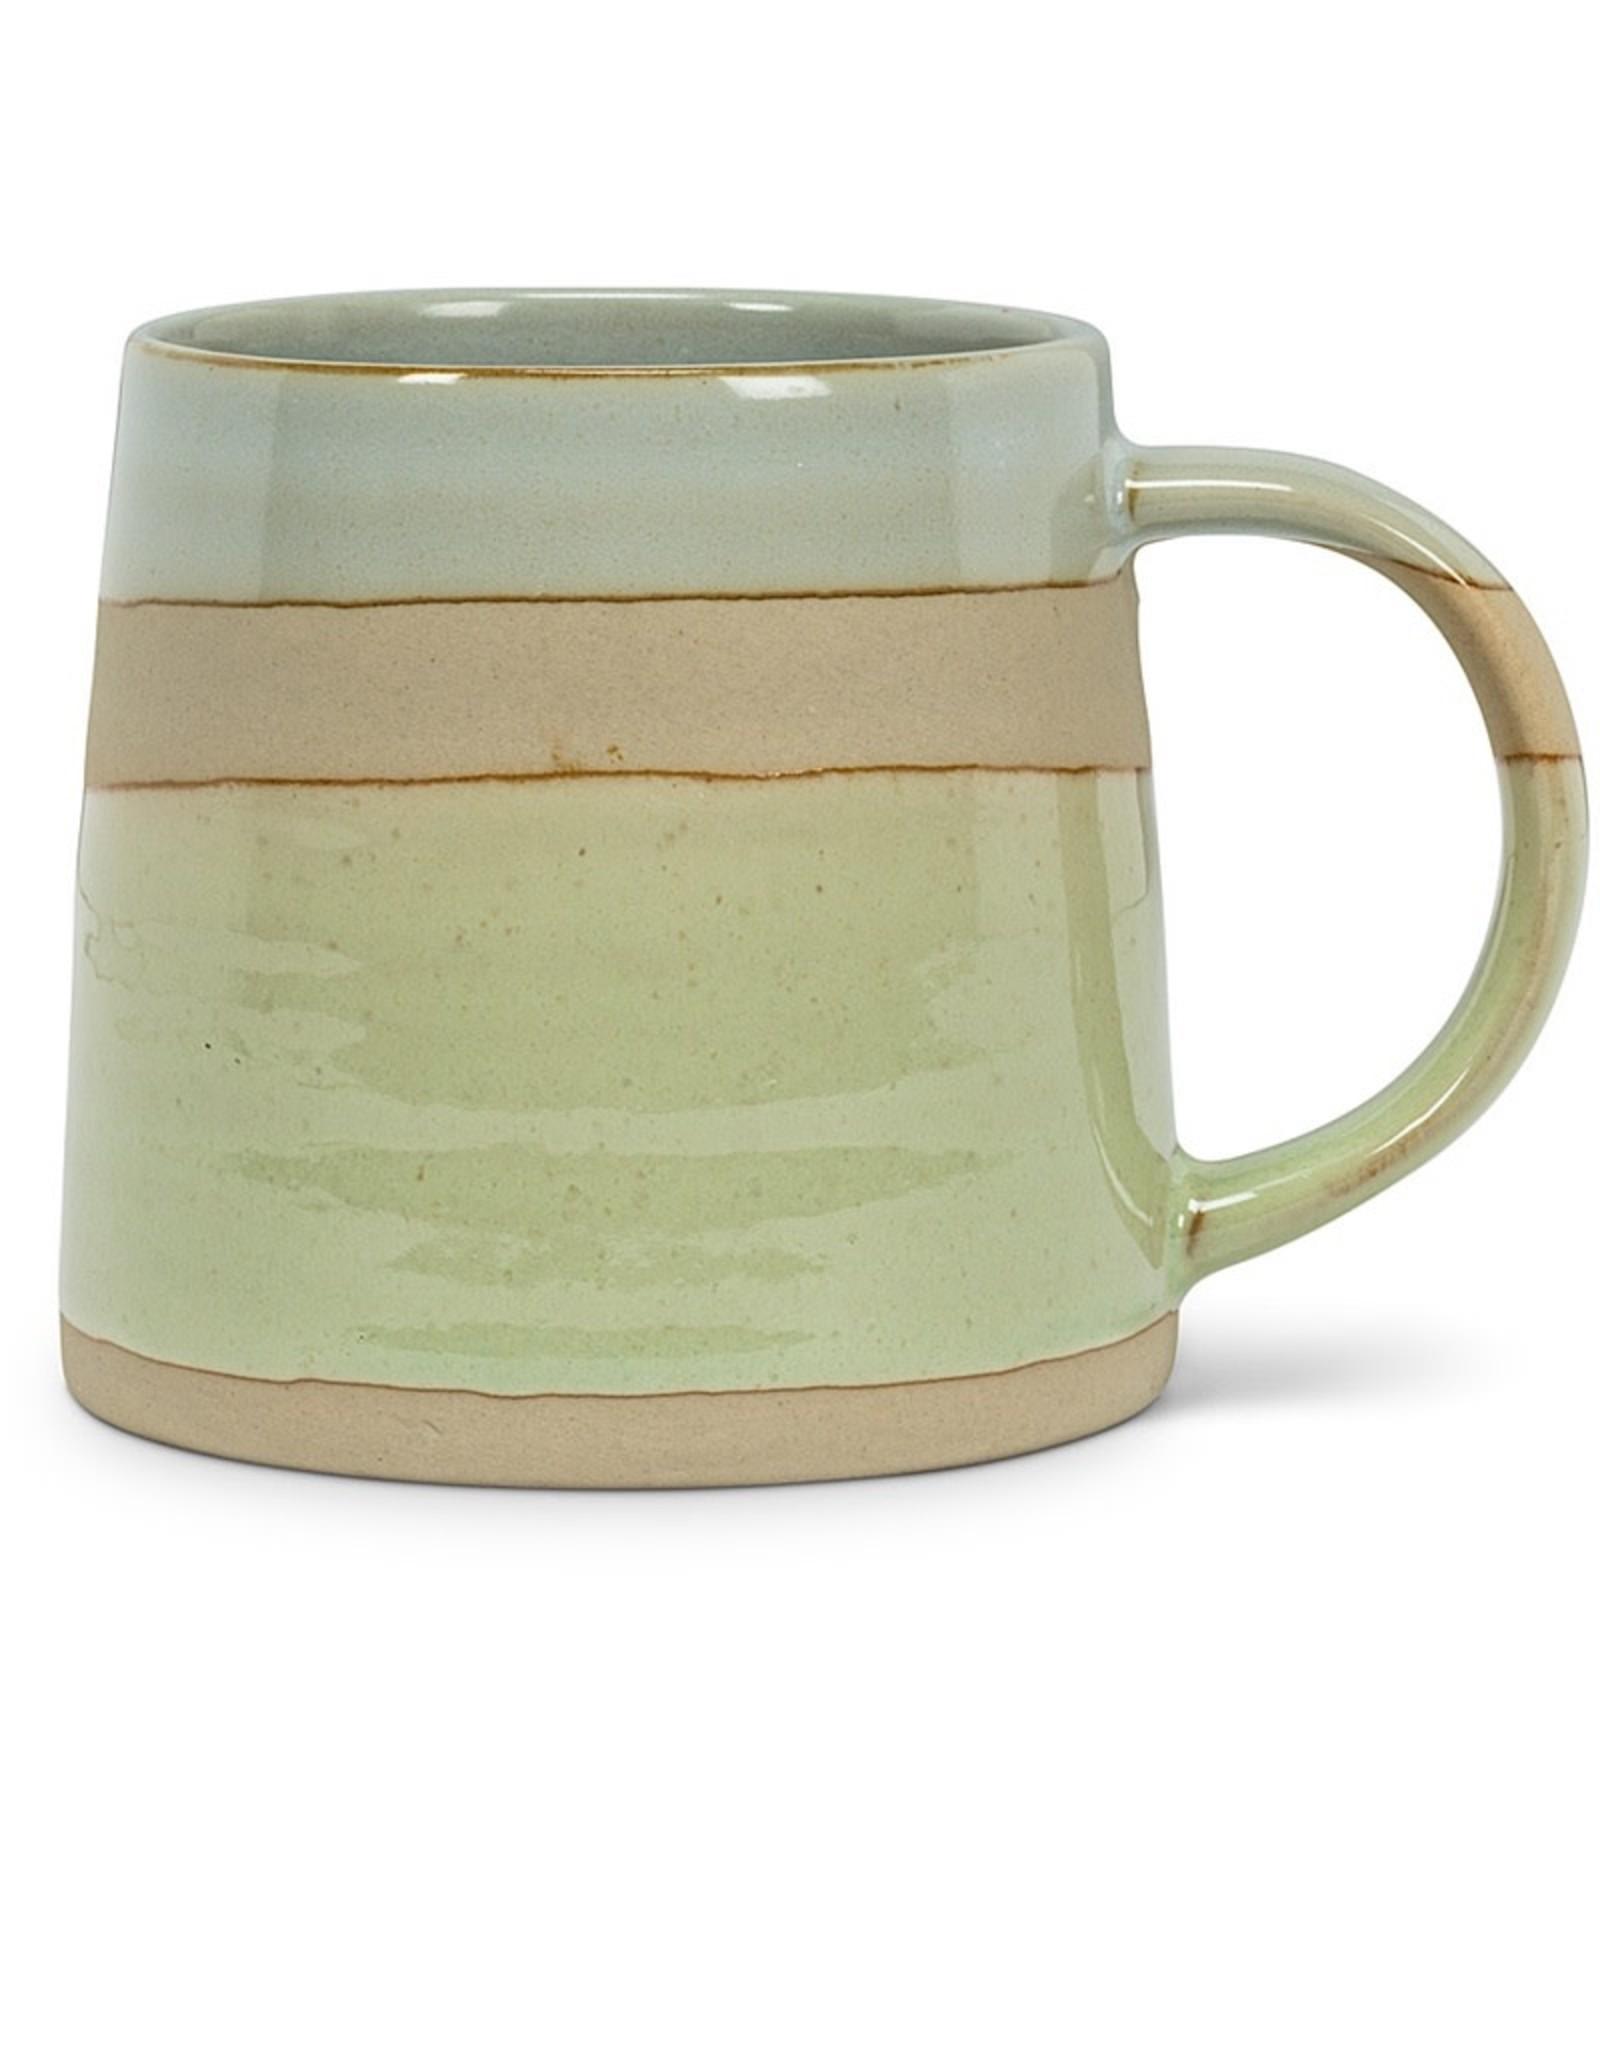 Rustic Style Mug